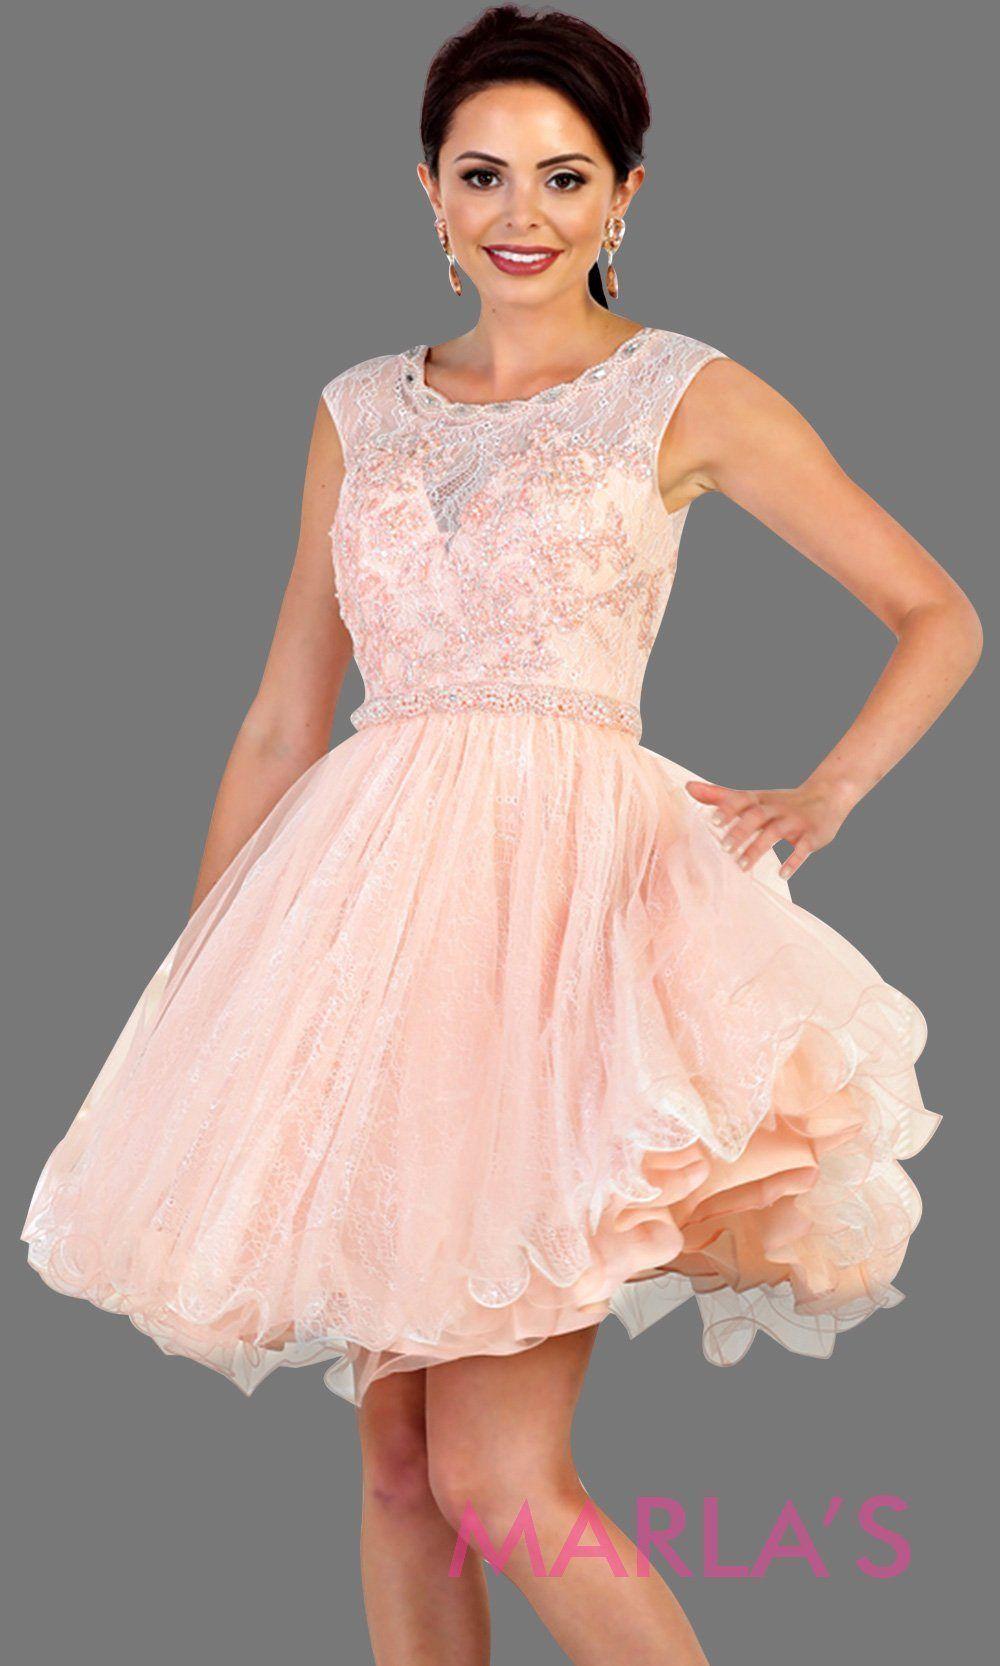 168da7b76b8e7 Perfect for grade 8 grad, graduation, light pink confirmation, quinceanera  damas, sweet 16, sweet 15, 18th birthday, semi formal, ballerina dress.